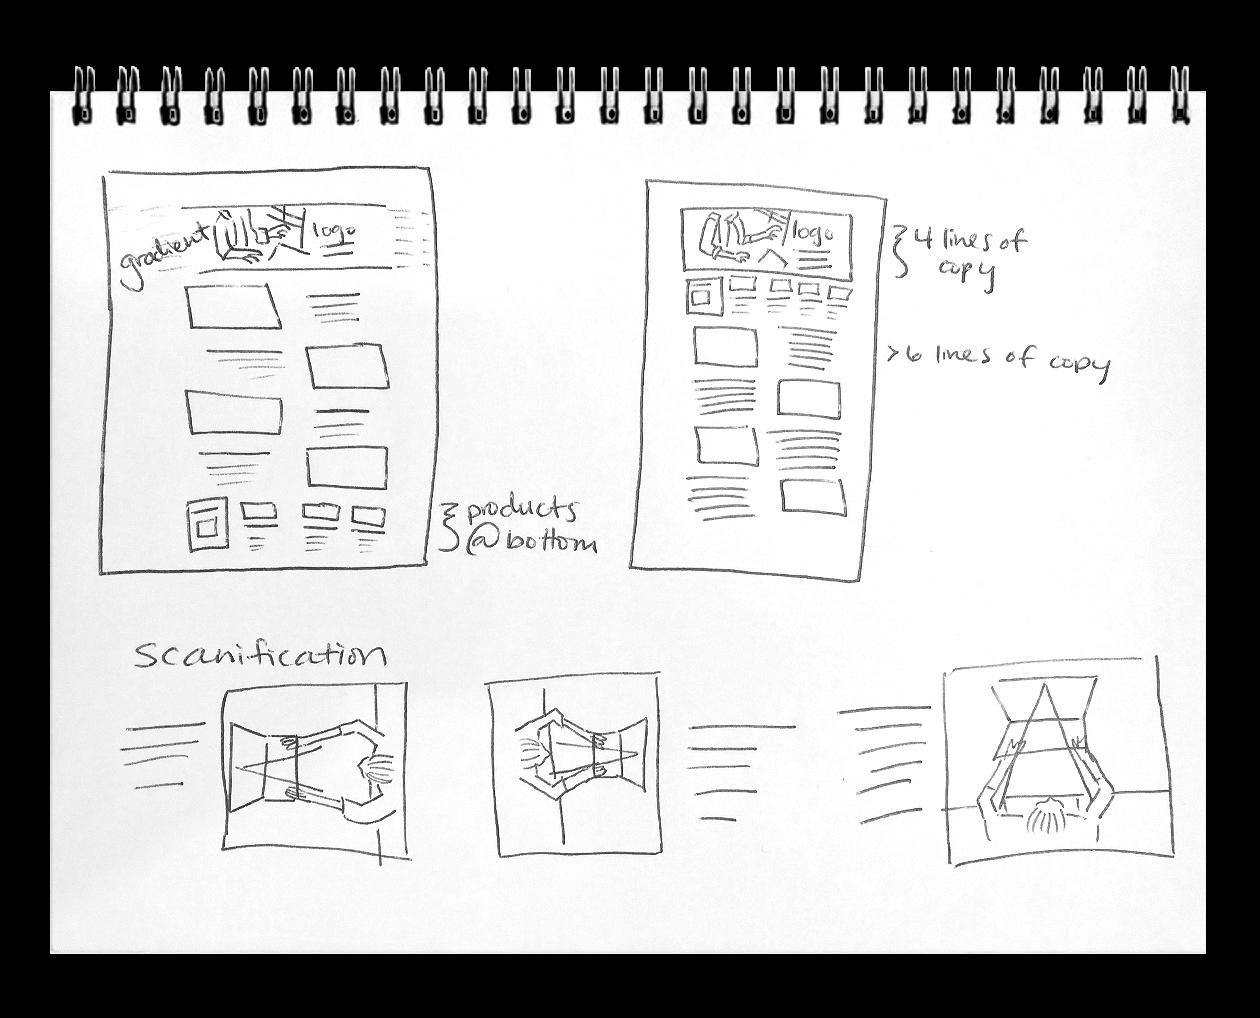 Microsoft_Intel_Realsense_sketch_pad.png